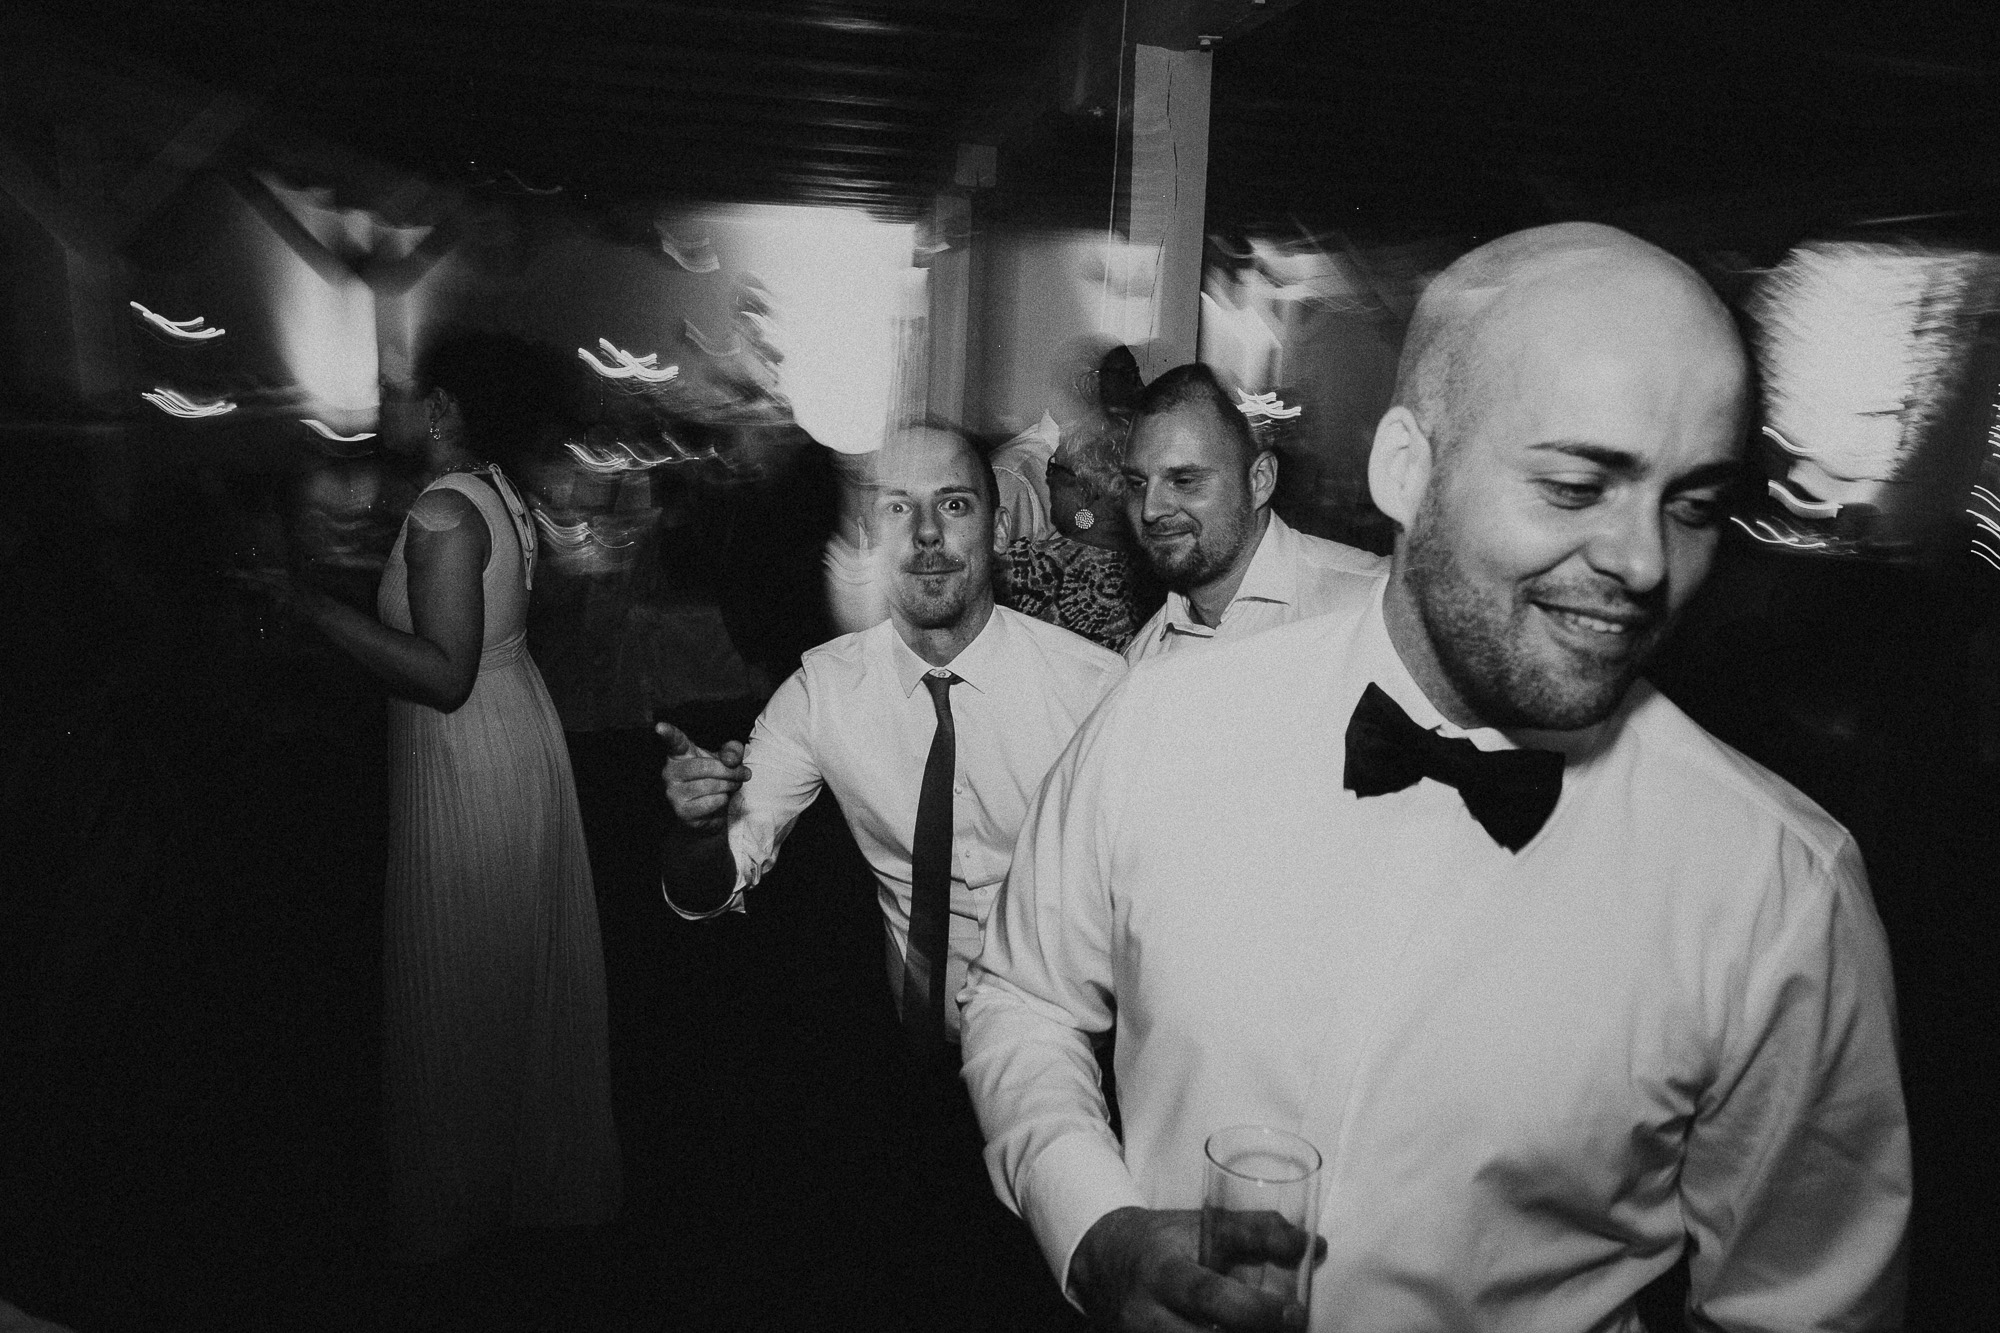 DanielaMarquardtPhotography_Hochzeitsfotograf_Düsseldorf_Köln_Mallorca_Bayern_Austria_Harz_Wedding_AileenundLennart_Weddingphotographer_Ibiza_Tuskany_Italien_Toskana_Portugal_Lissabon283